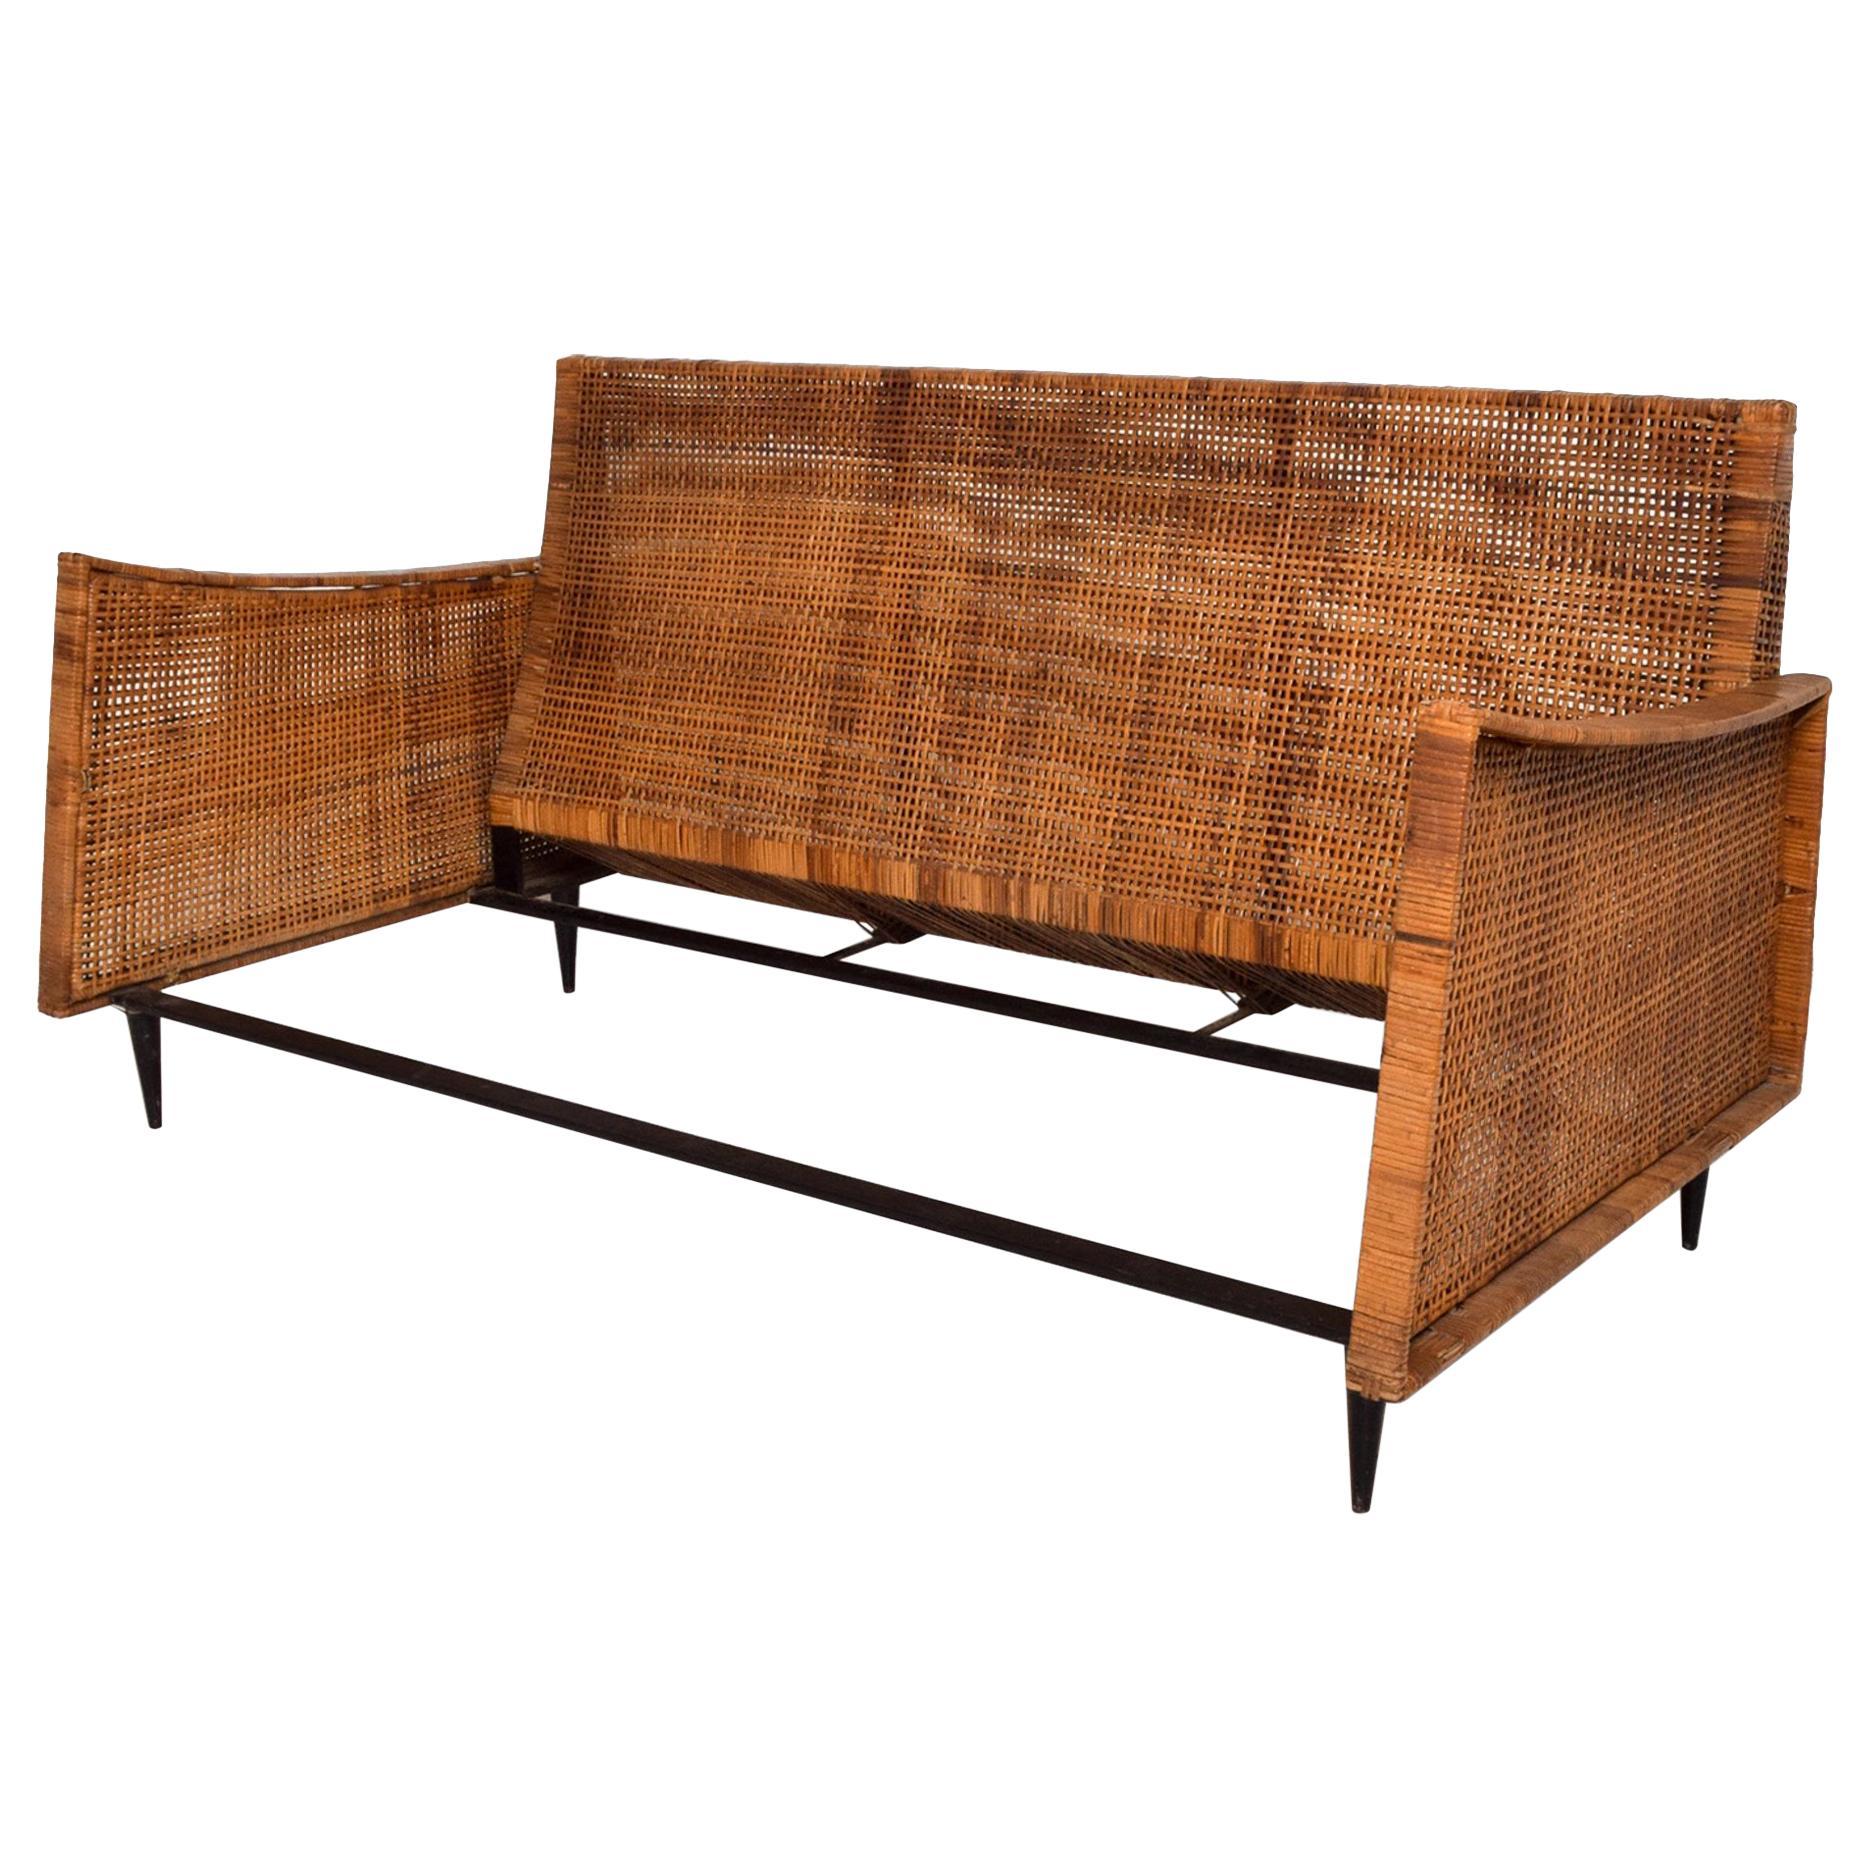 Magnificent Cane Loveseat Sofa Sculptural Settee Arturo Pani Modernism 1960s